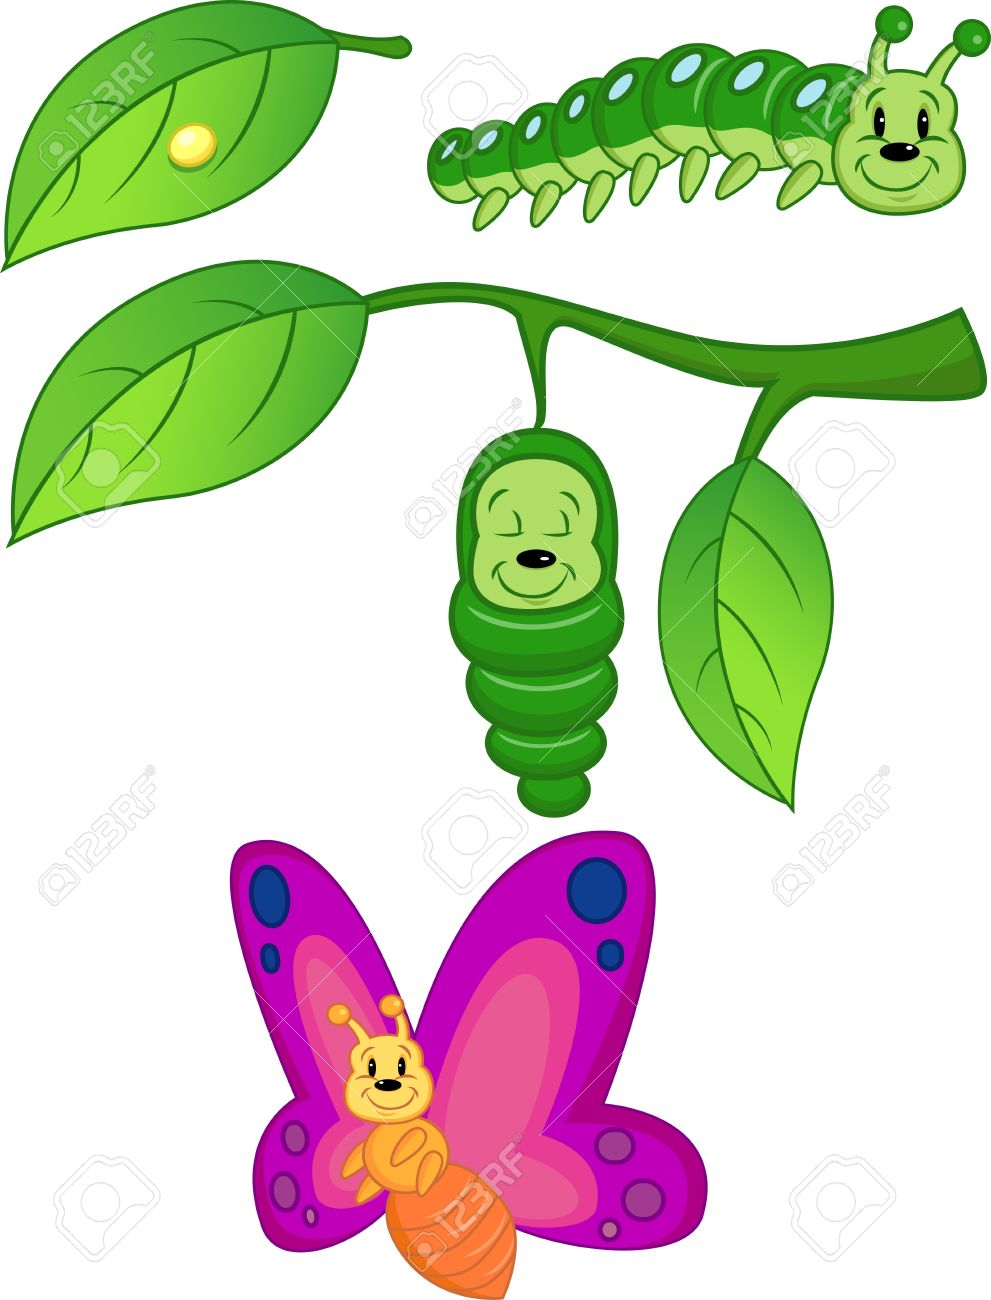 Cat Caterpillar To Butterfly Cartoon Images